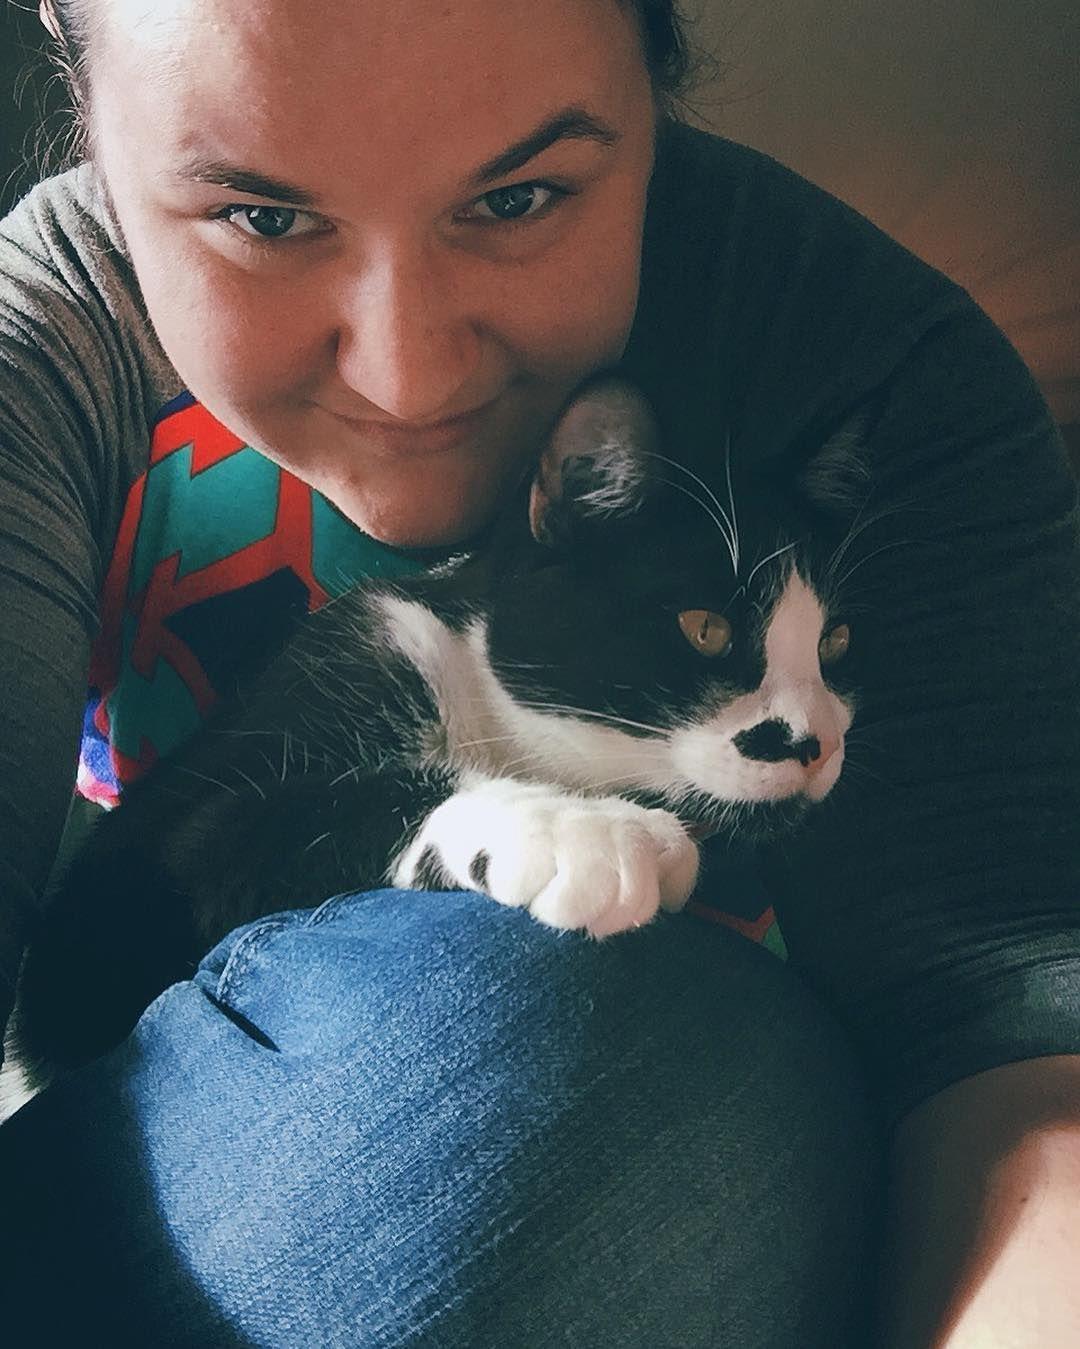 He misses me. (: #TuxedoCatsOfInstagram #TuxedoCats #SirBandit #Meow #Cat #FynnAndBandit #CatsOfInstagram #KittysOfInstagram #Kitten by domaflinkieg http://www.australiaunwrapped.com/